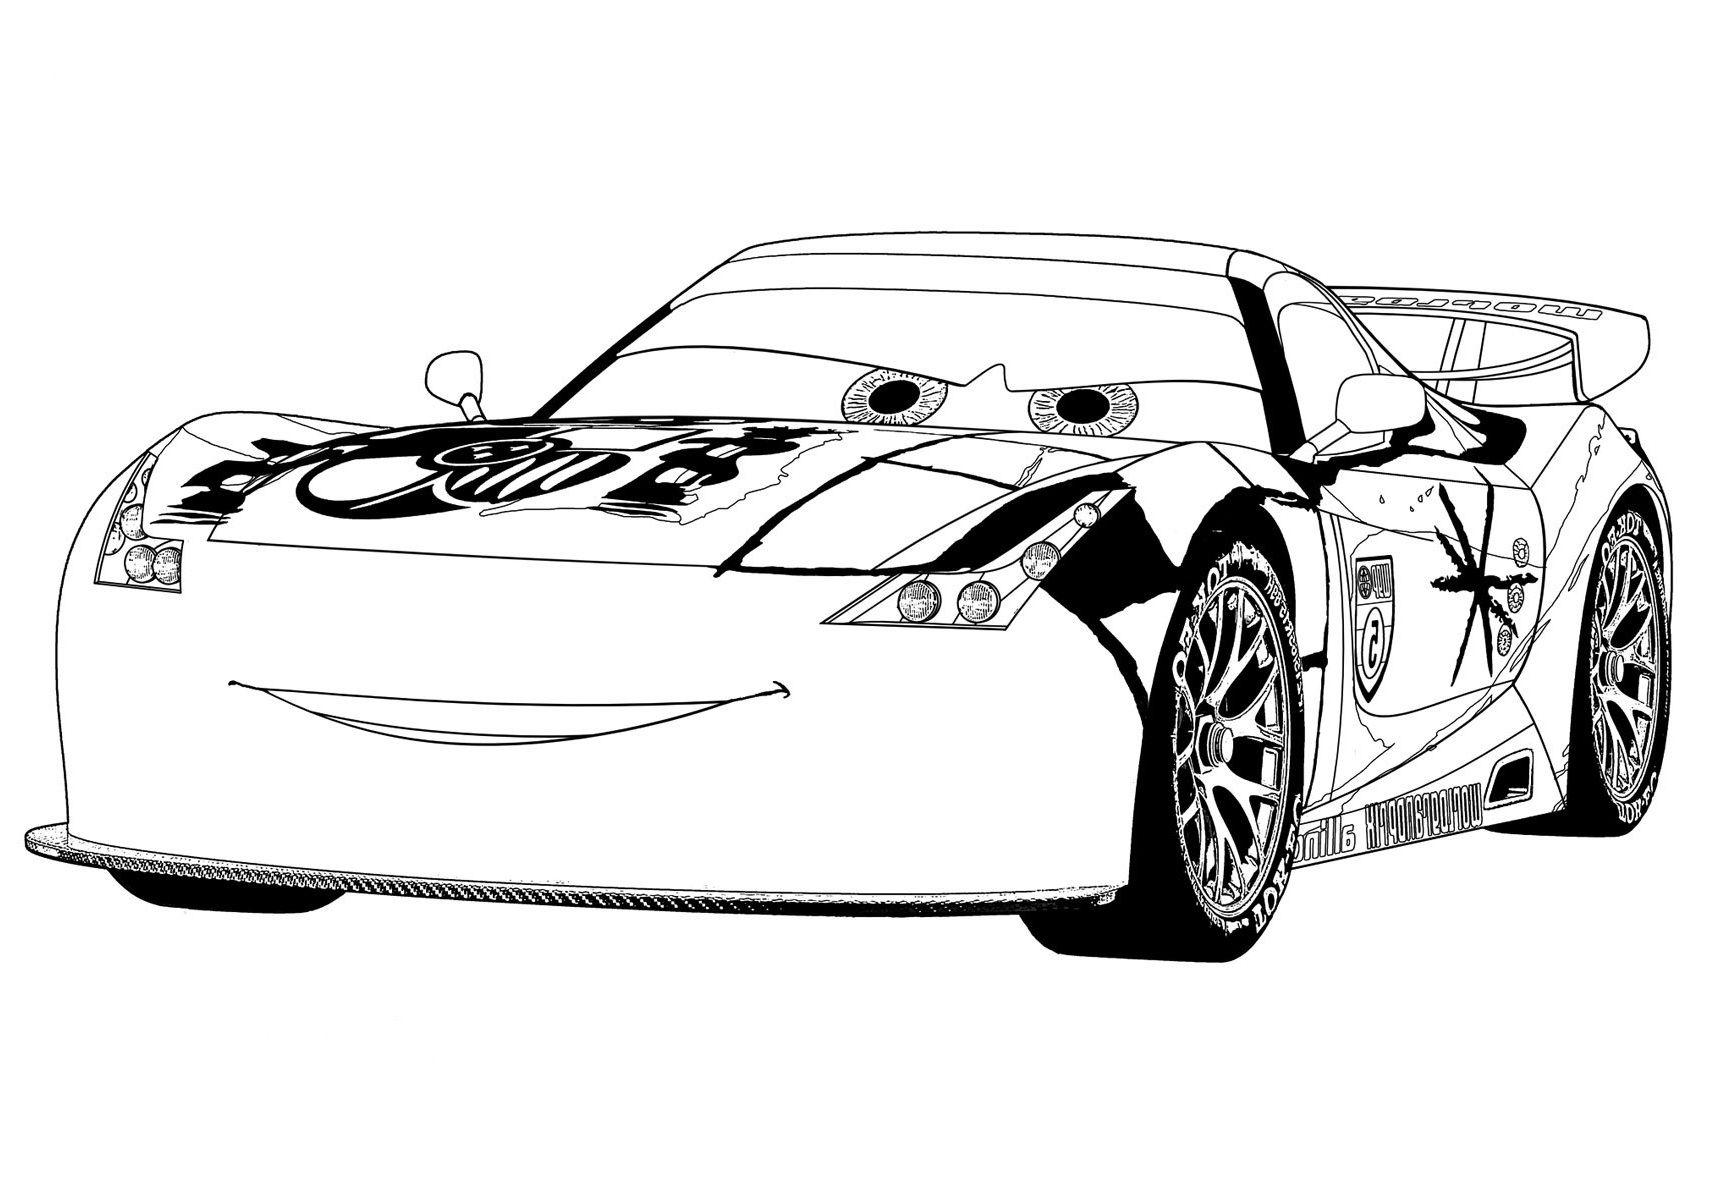 Enjoyable Cars 2 Auto Electrical Wiring Diagram Wiring Cloud Picalendutblikvittorg